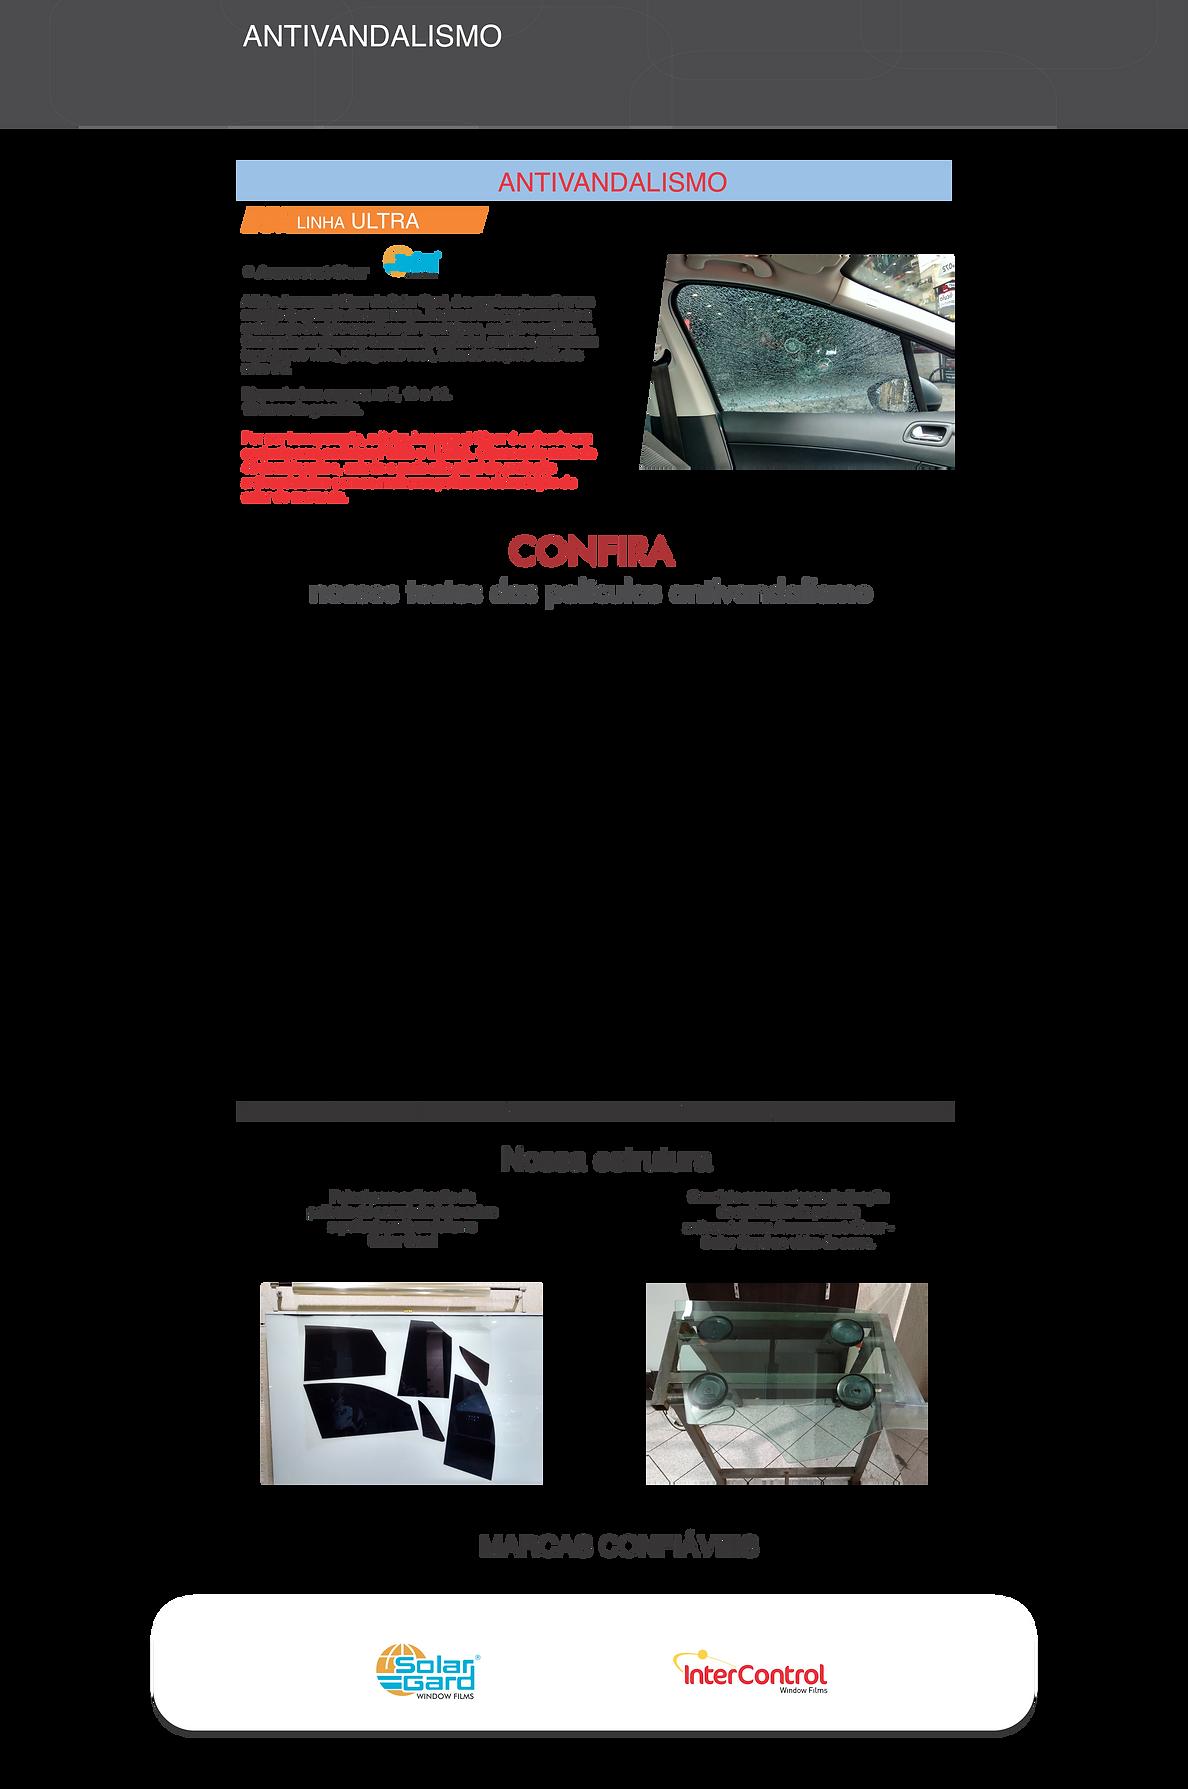 Pagina antivandalismo - site wix 2021.png